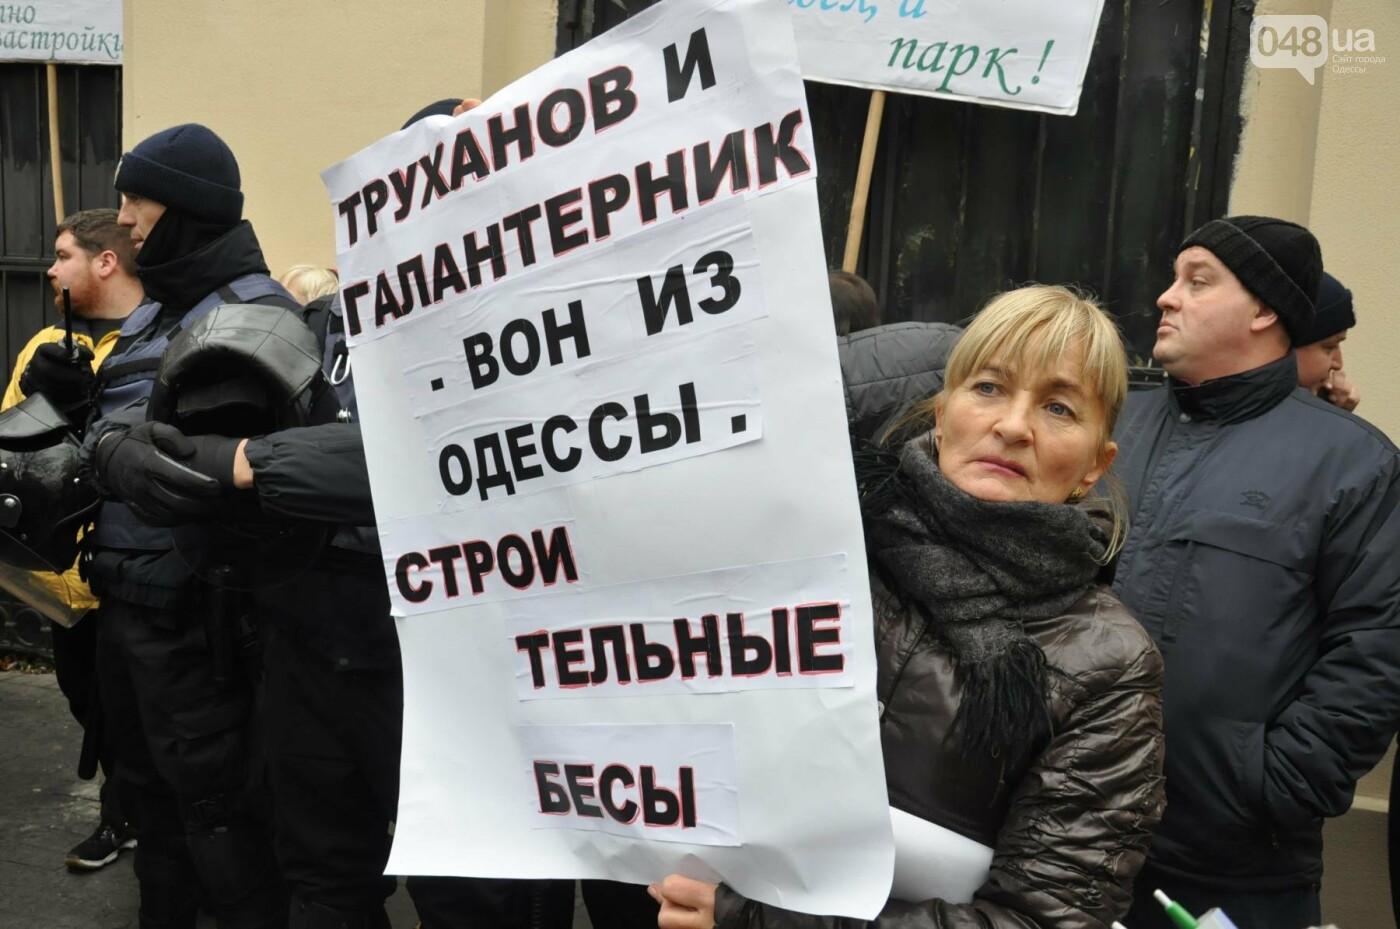 Около 5 сотен одесситов протестовали против застройки Горсада (ФОТО) , фото-3